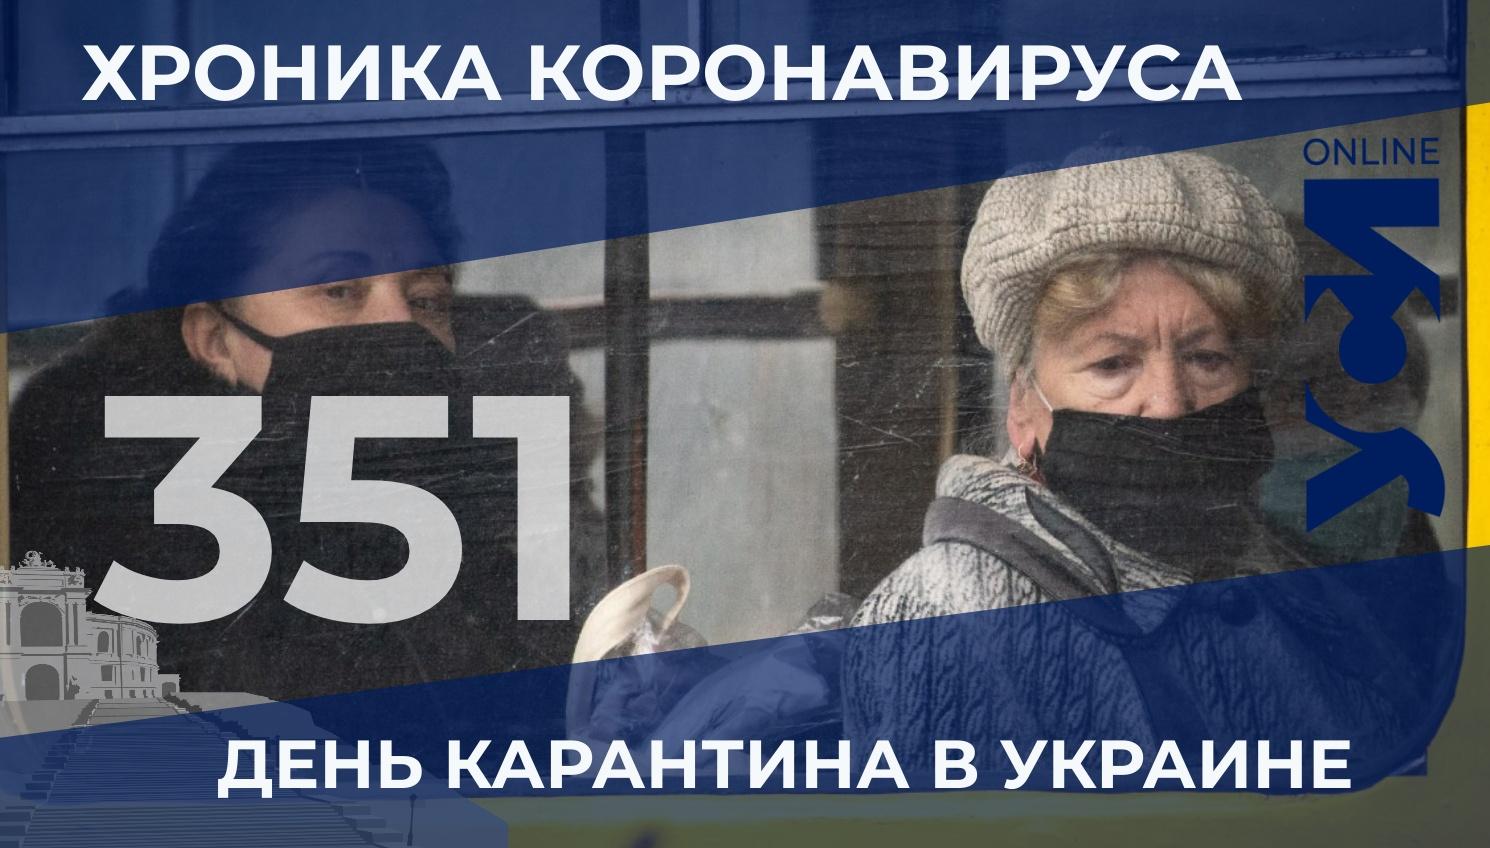 Хроника пандемии: в Одесской области началась вакцинация «фото»